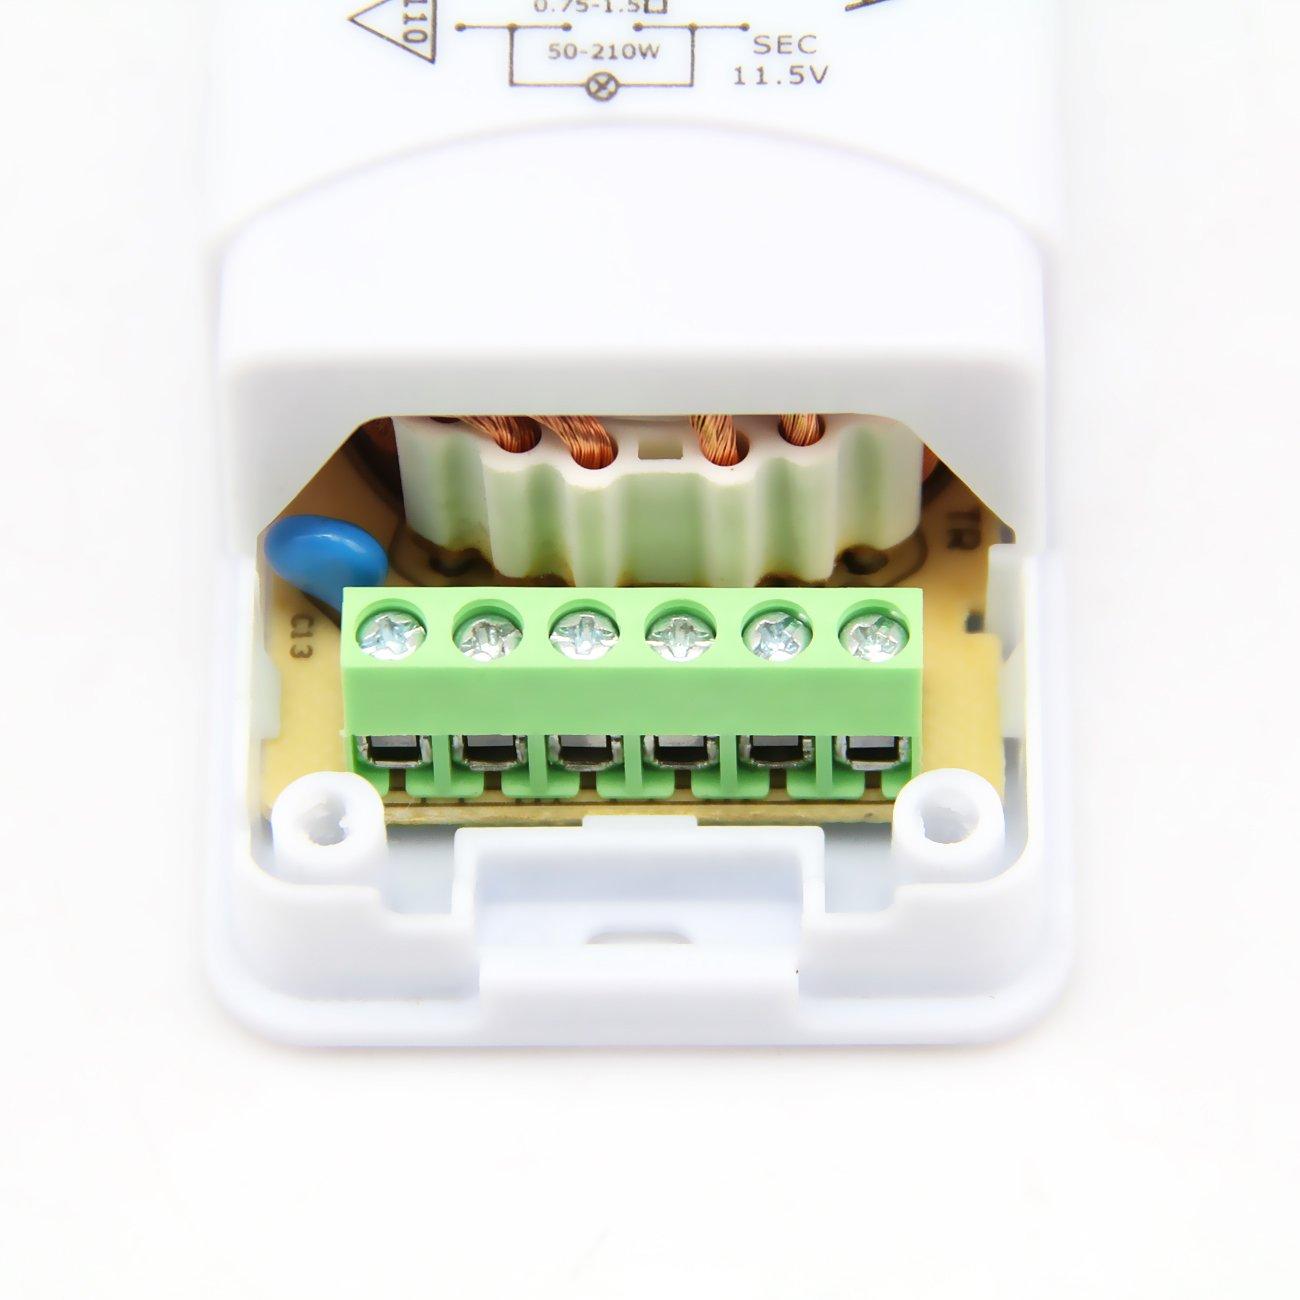 Eagle Rise Transformador electr/ónico para hal/ógenos 230 a 12 V CA, 50-210 W